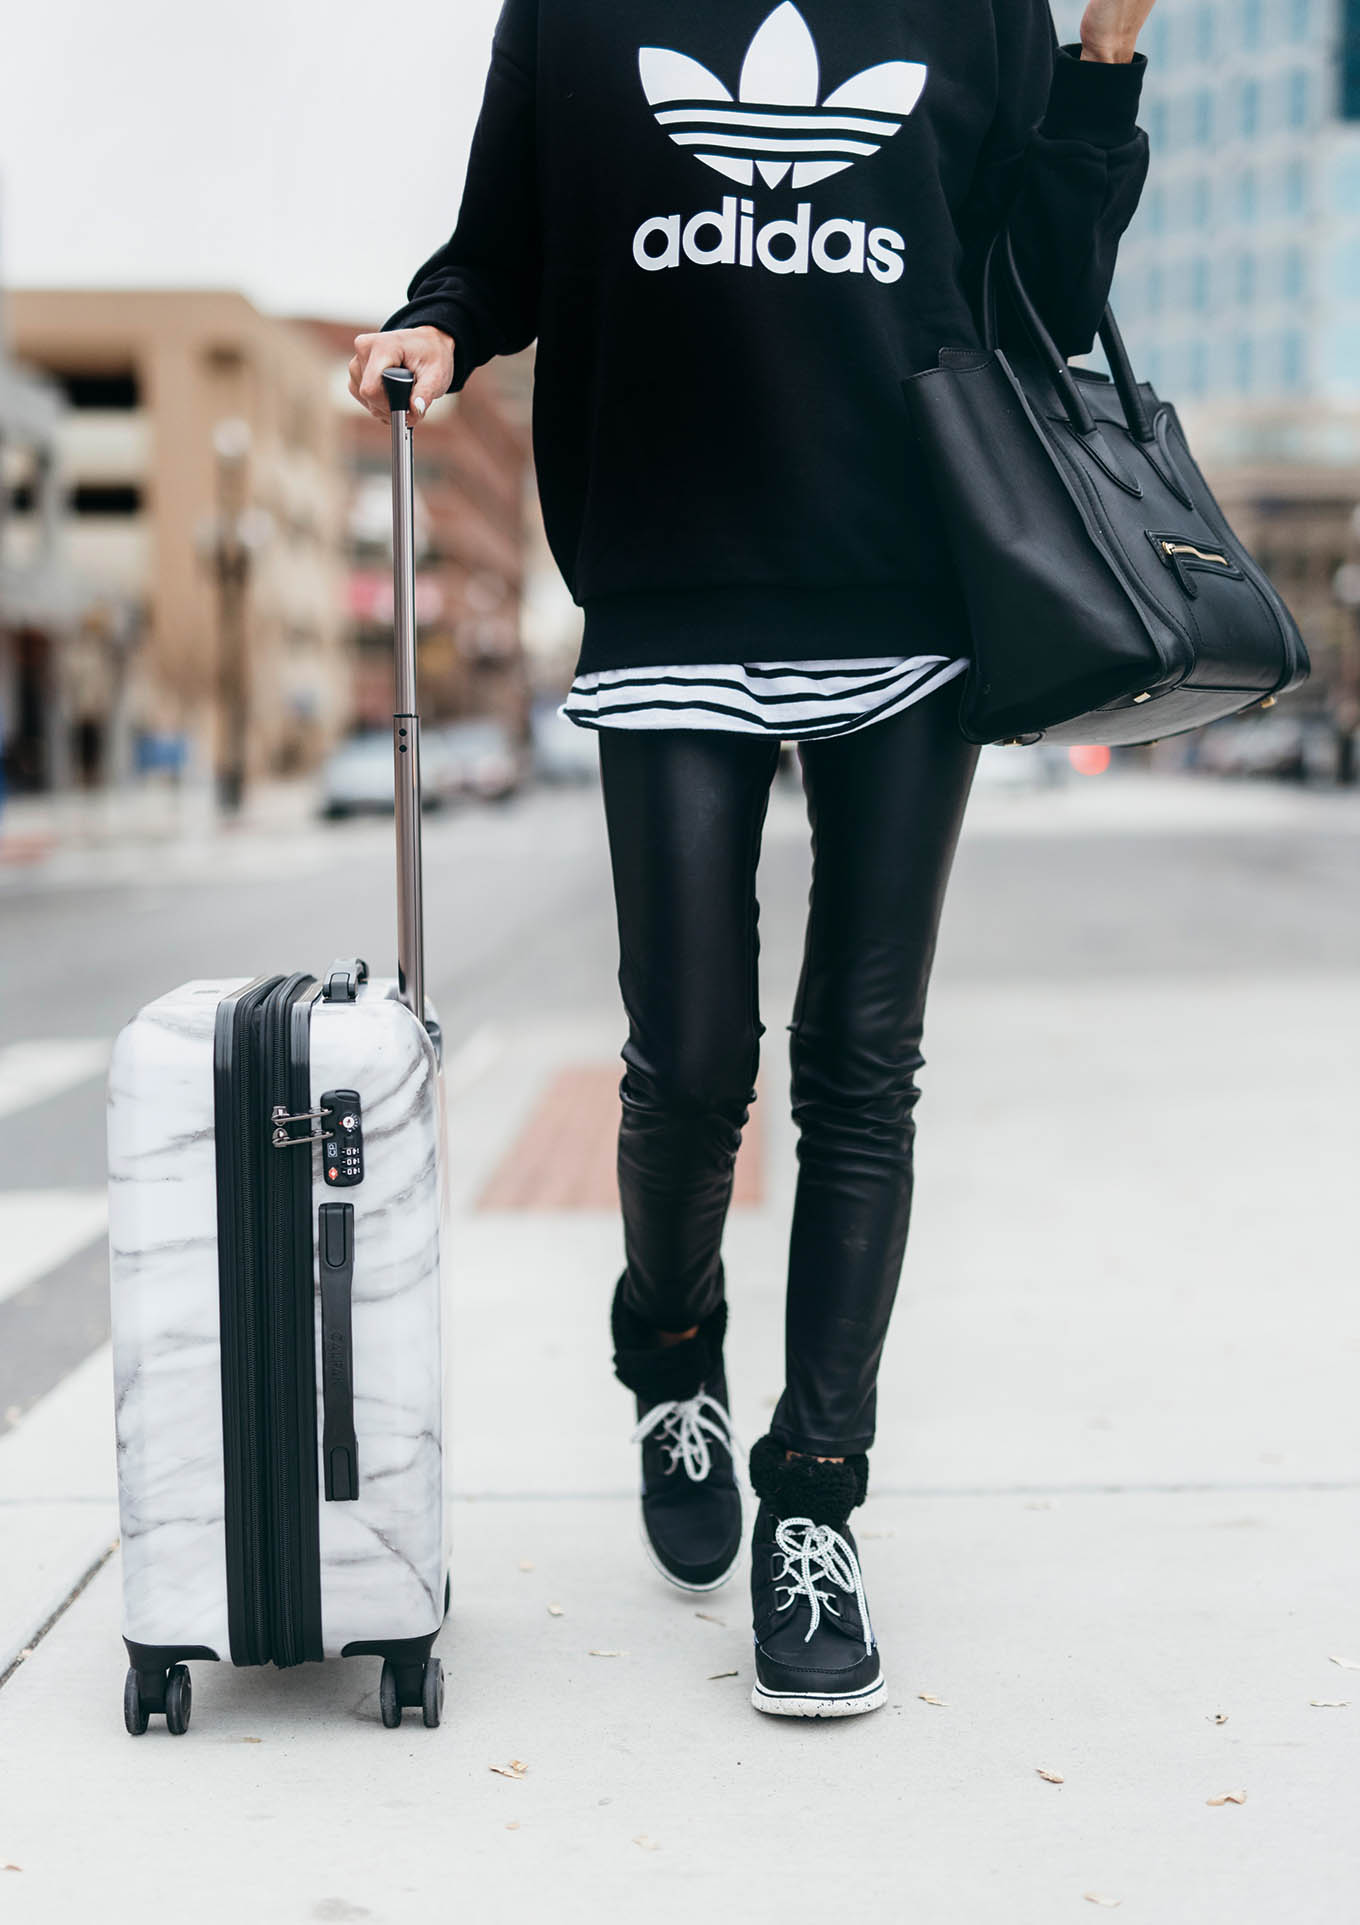 adidas-hello-fashion